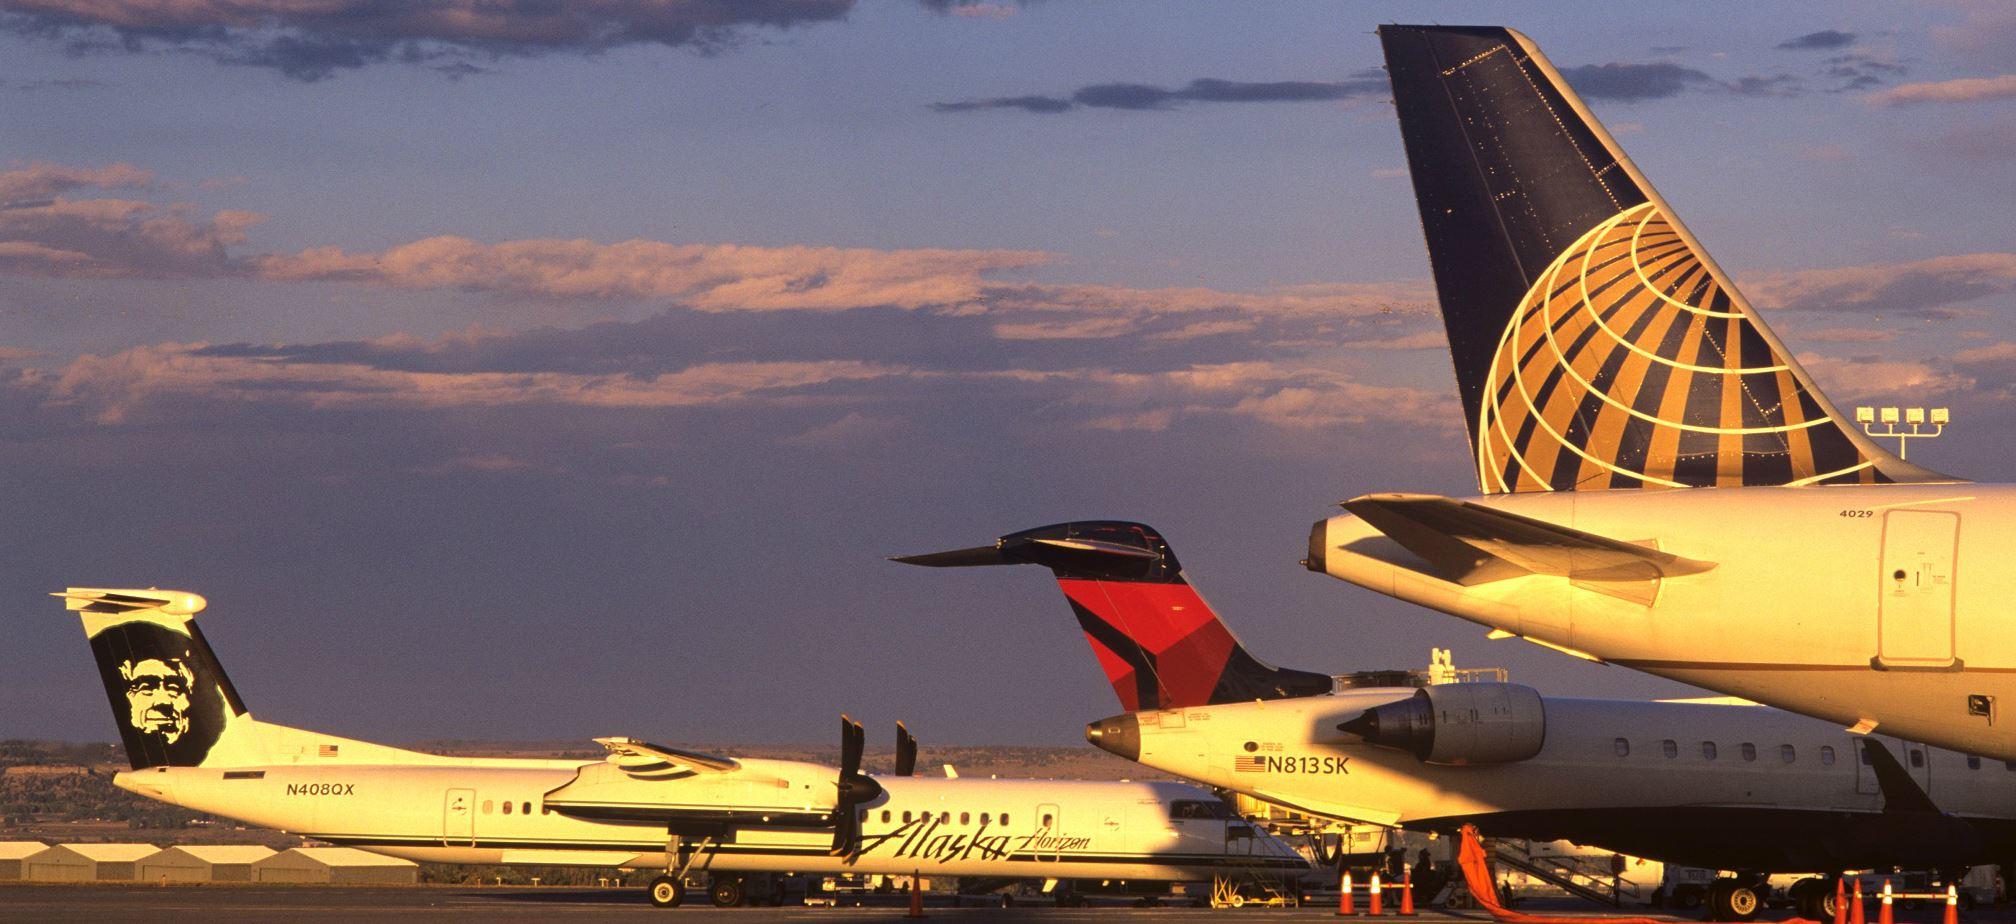 Major Airlines   Billings Airport, MT - Official Website